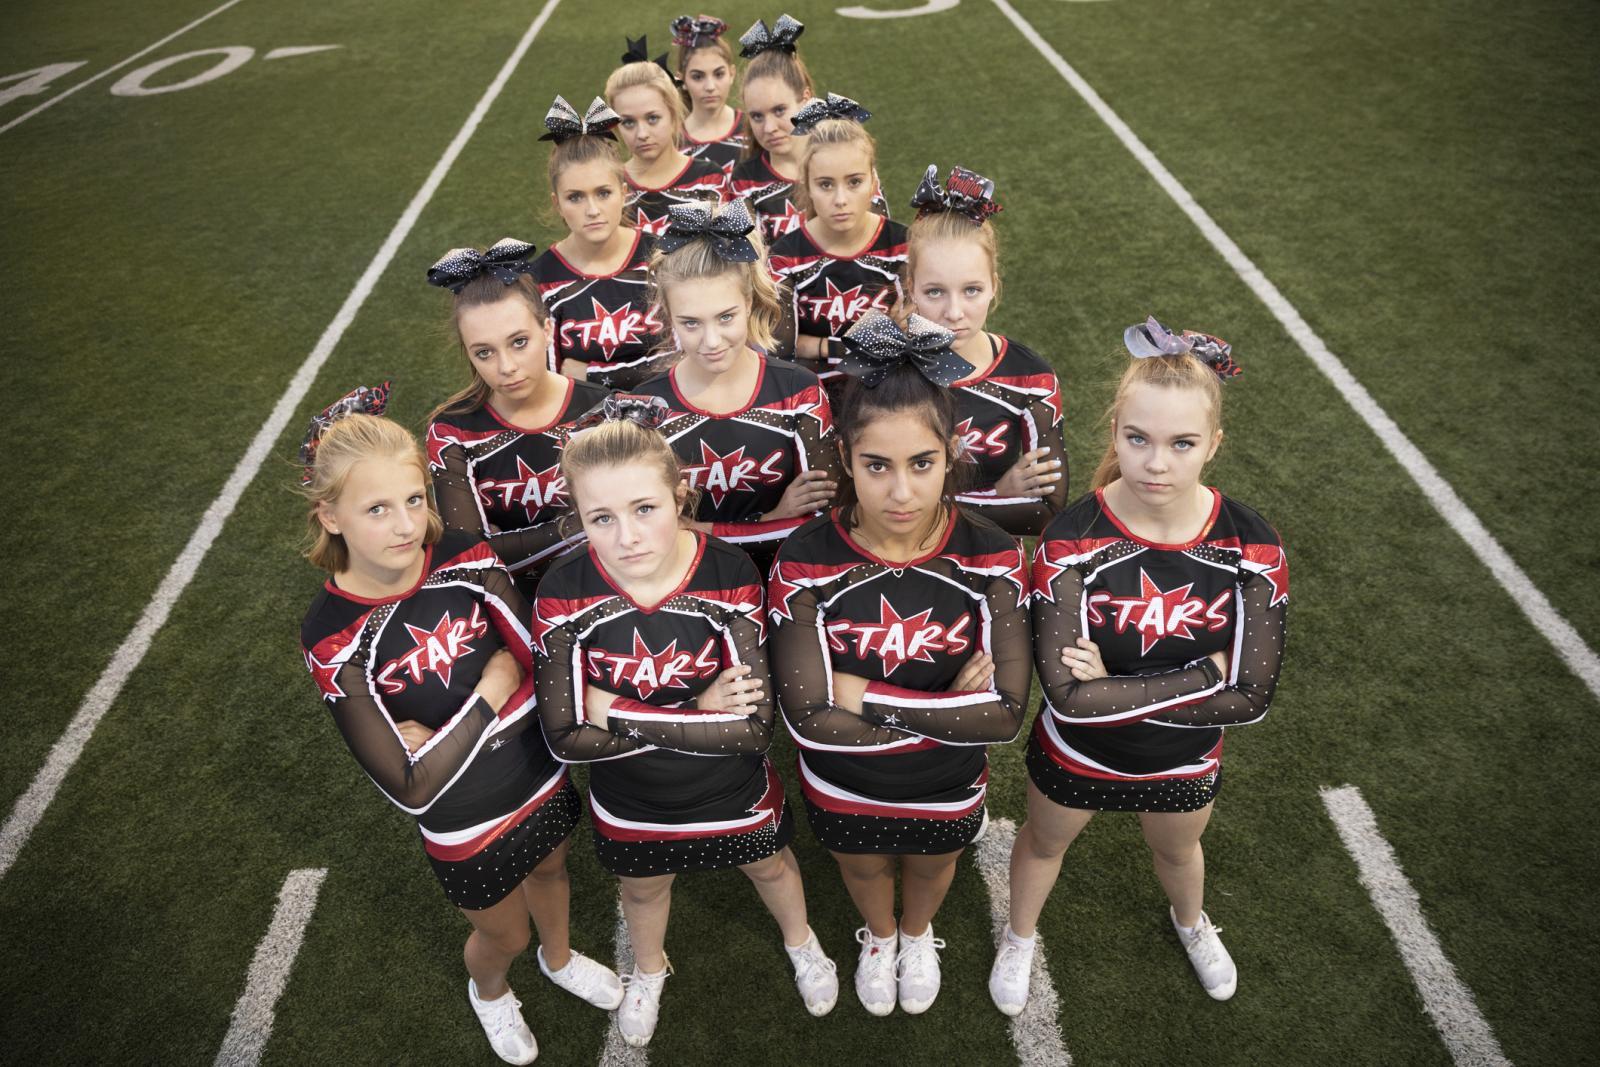 High school cheerleading team on football field